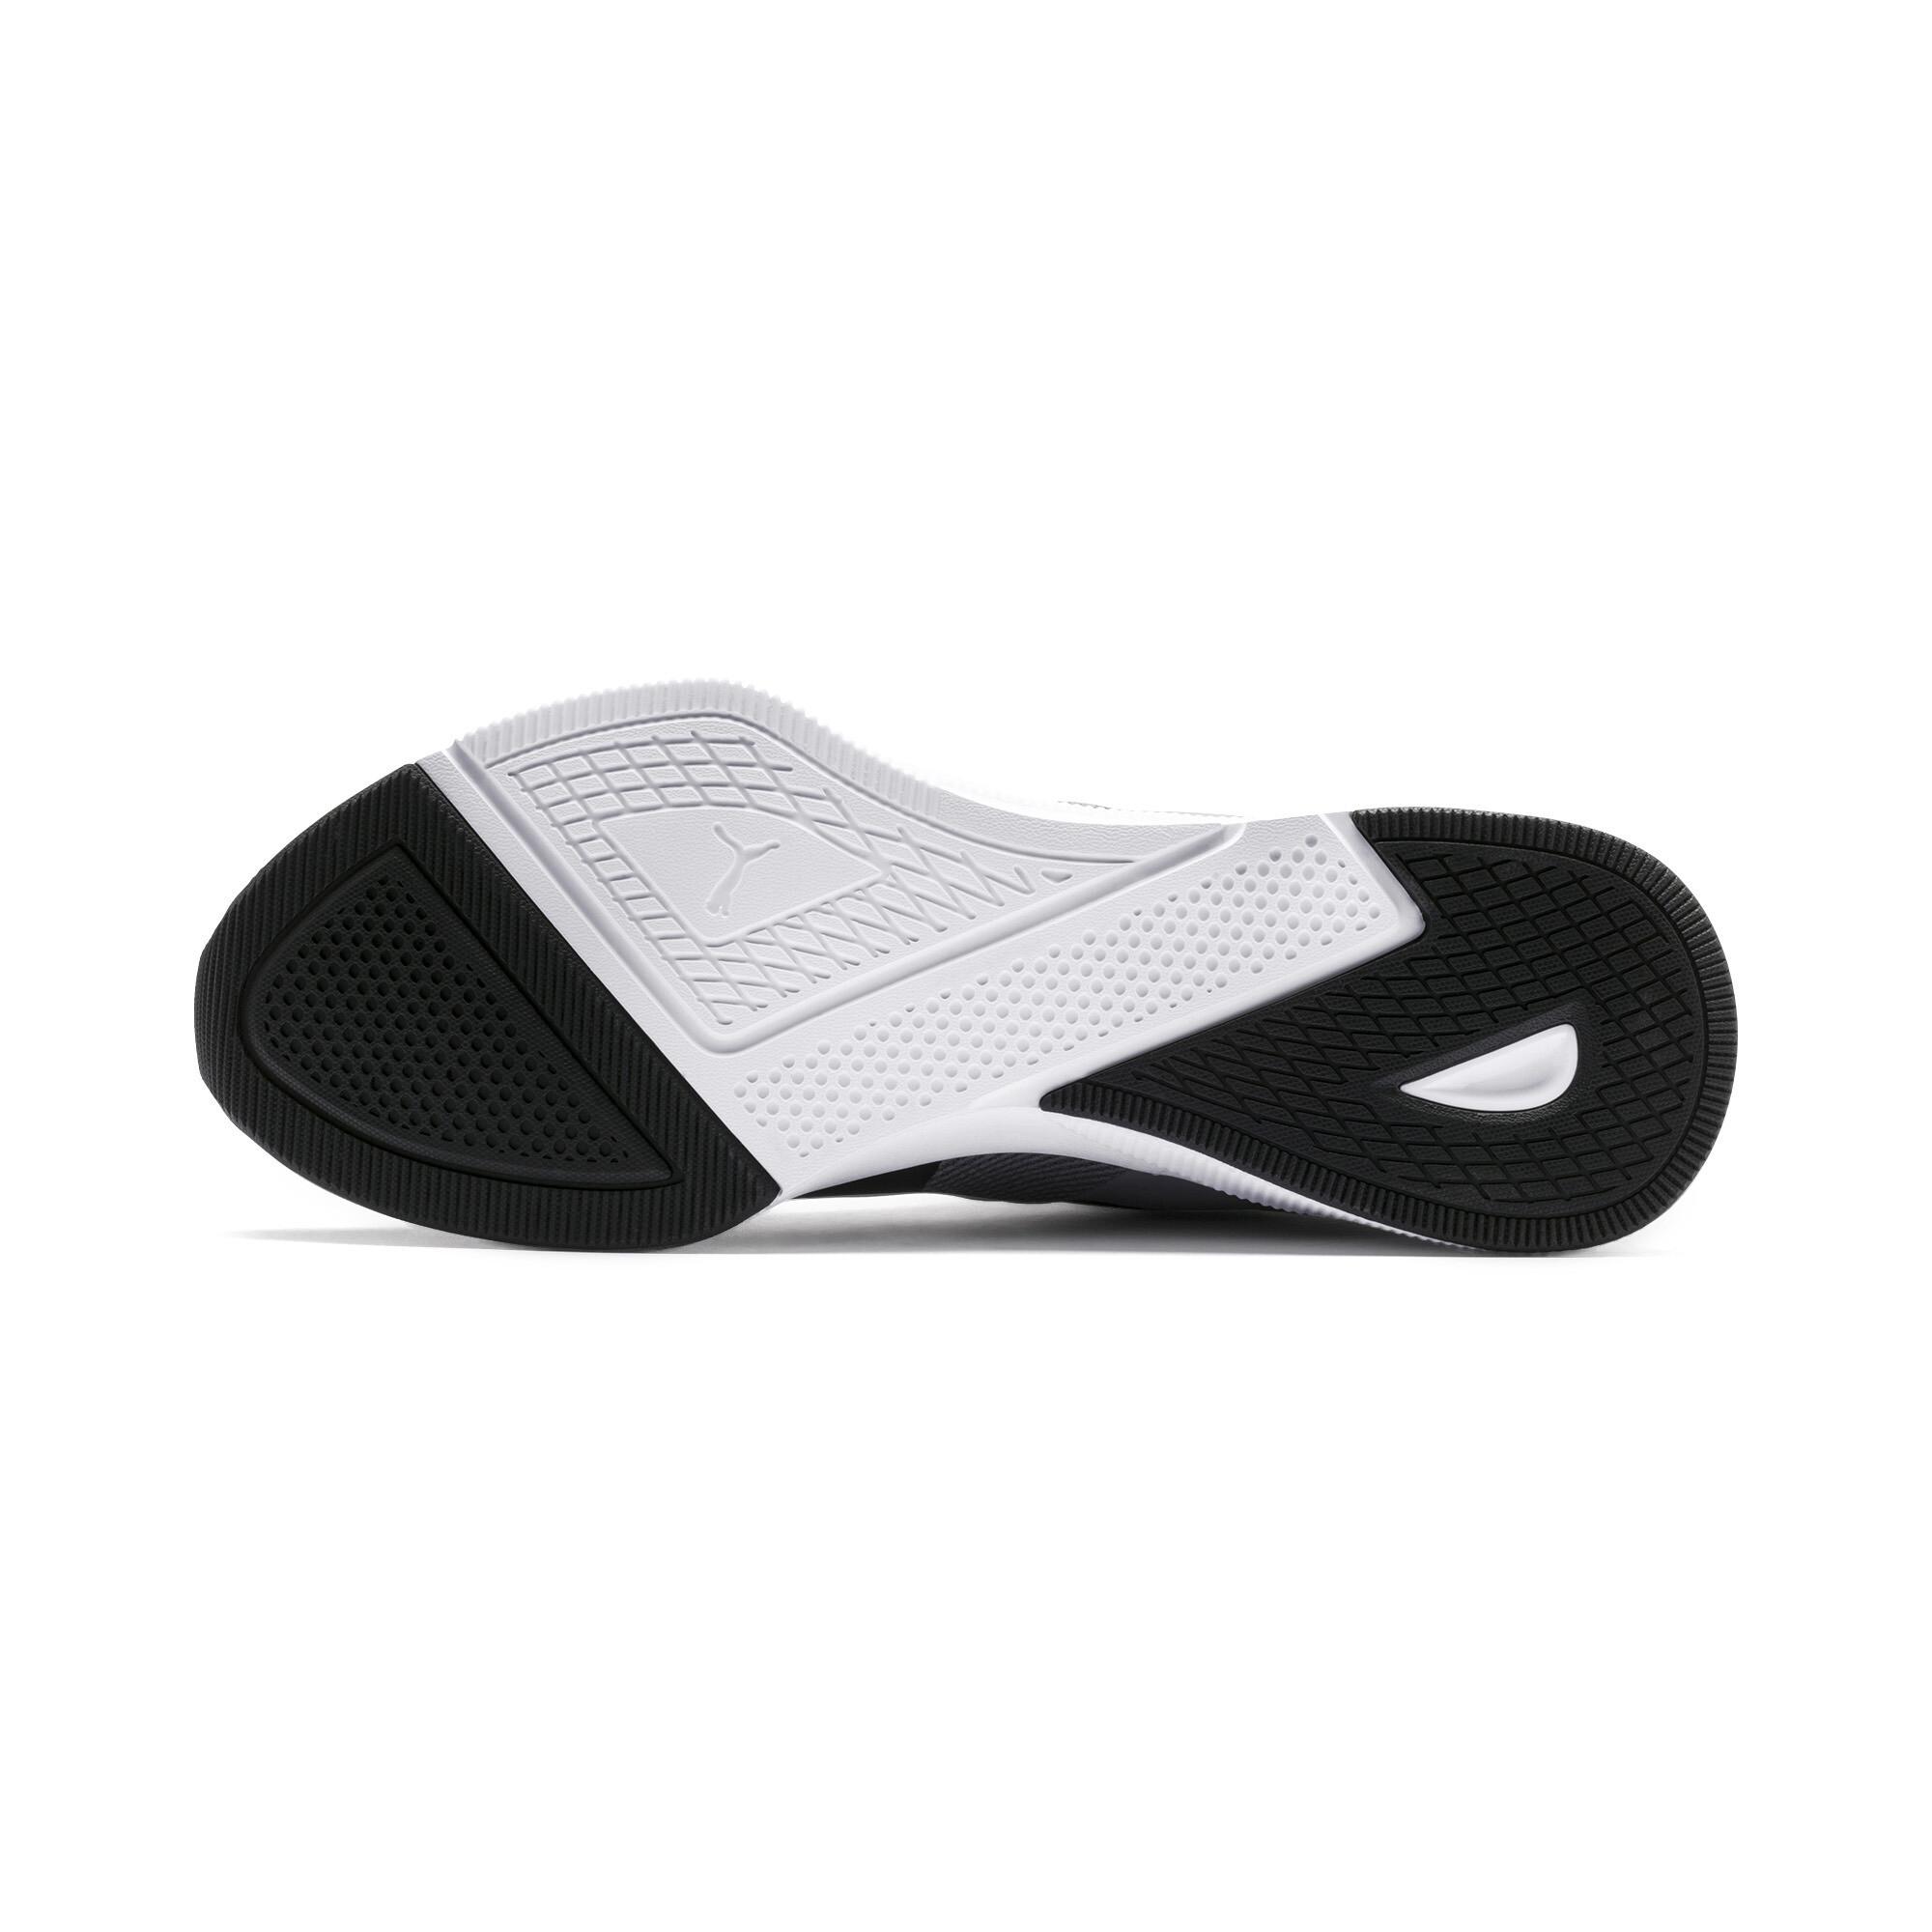 PUMA-Flyer-Runner-Running-Shoes-Mens-Shoe-Running thumbnail 18